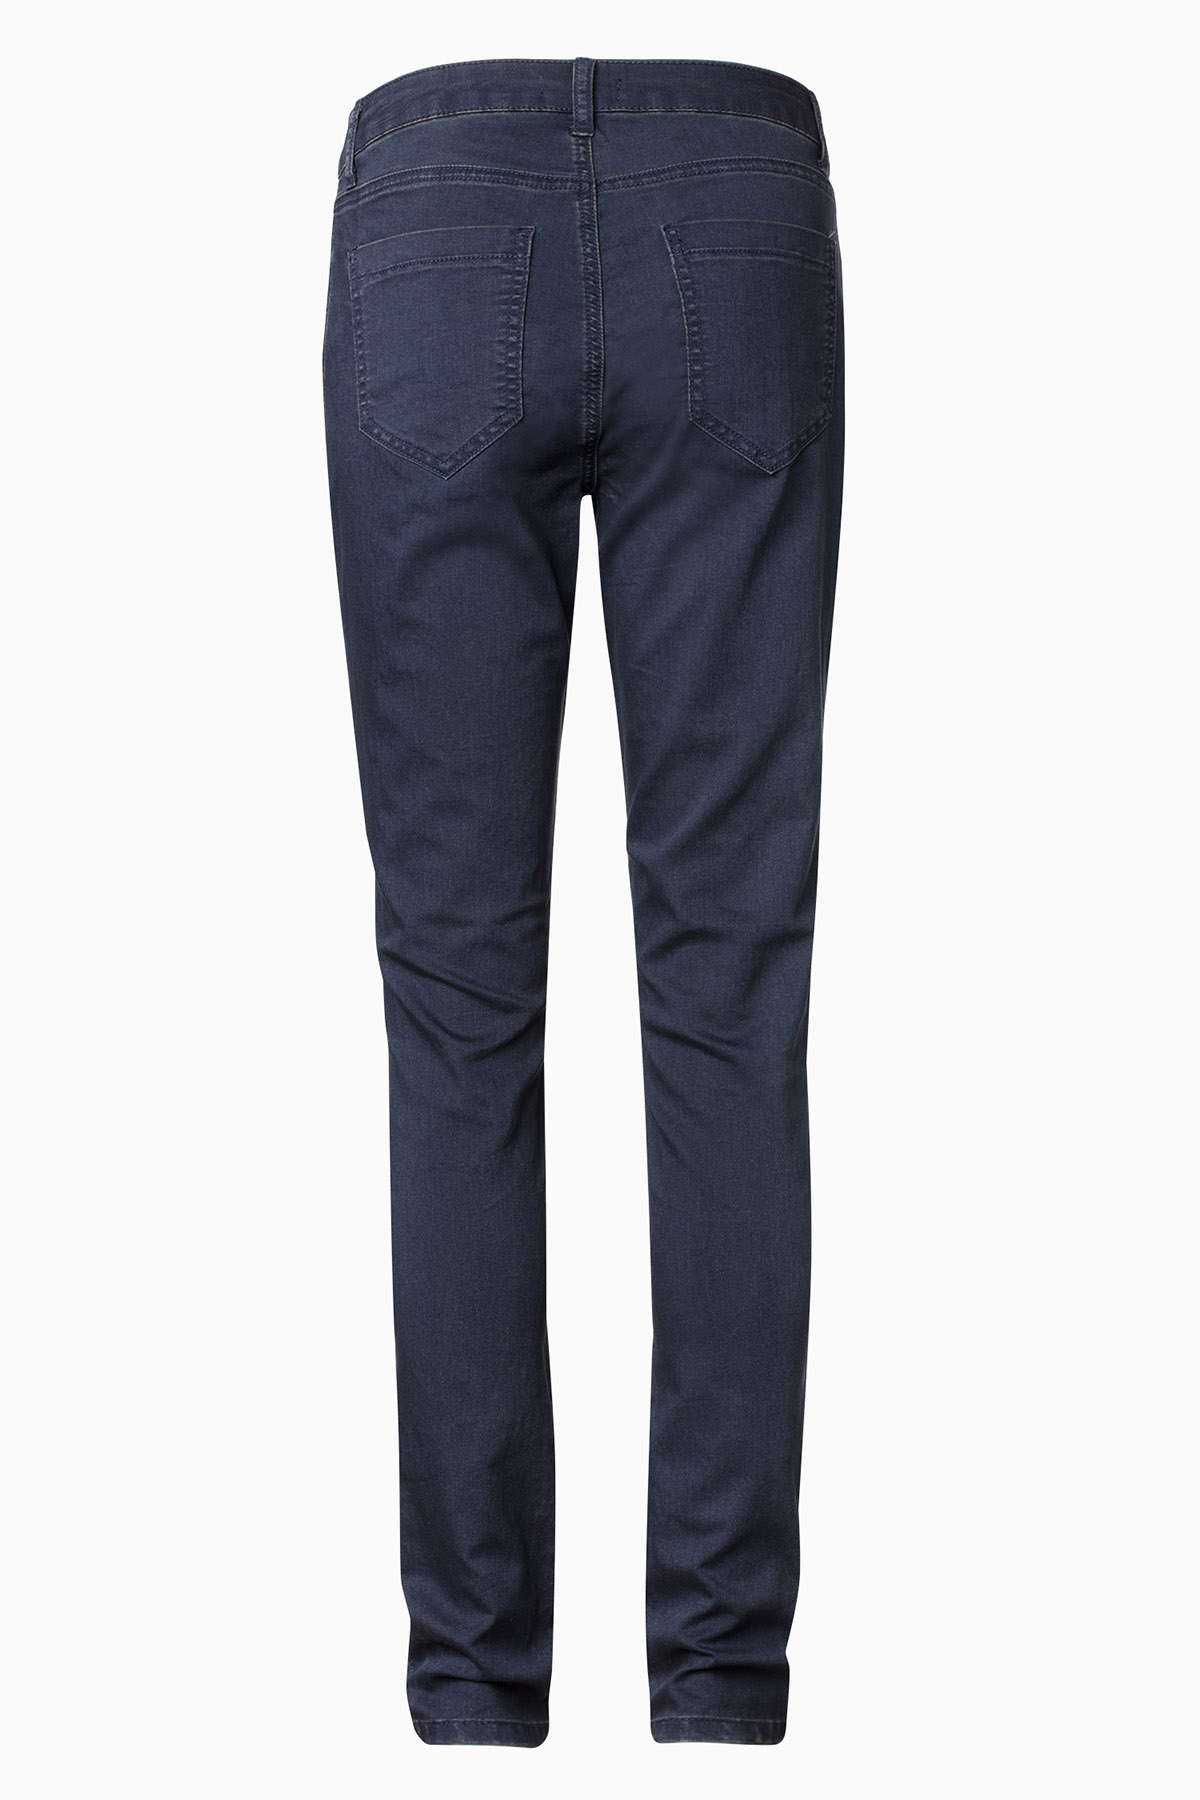 Mørk denimblå Casual bukser fra Bon'A Parte – Køb Mørk denimblå Casual bukser fra str. 34-54 her